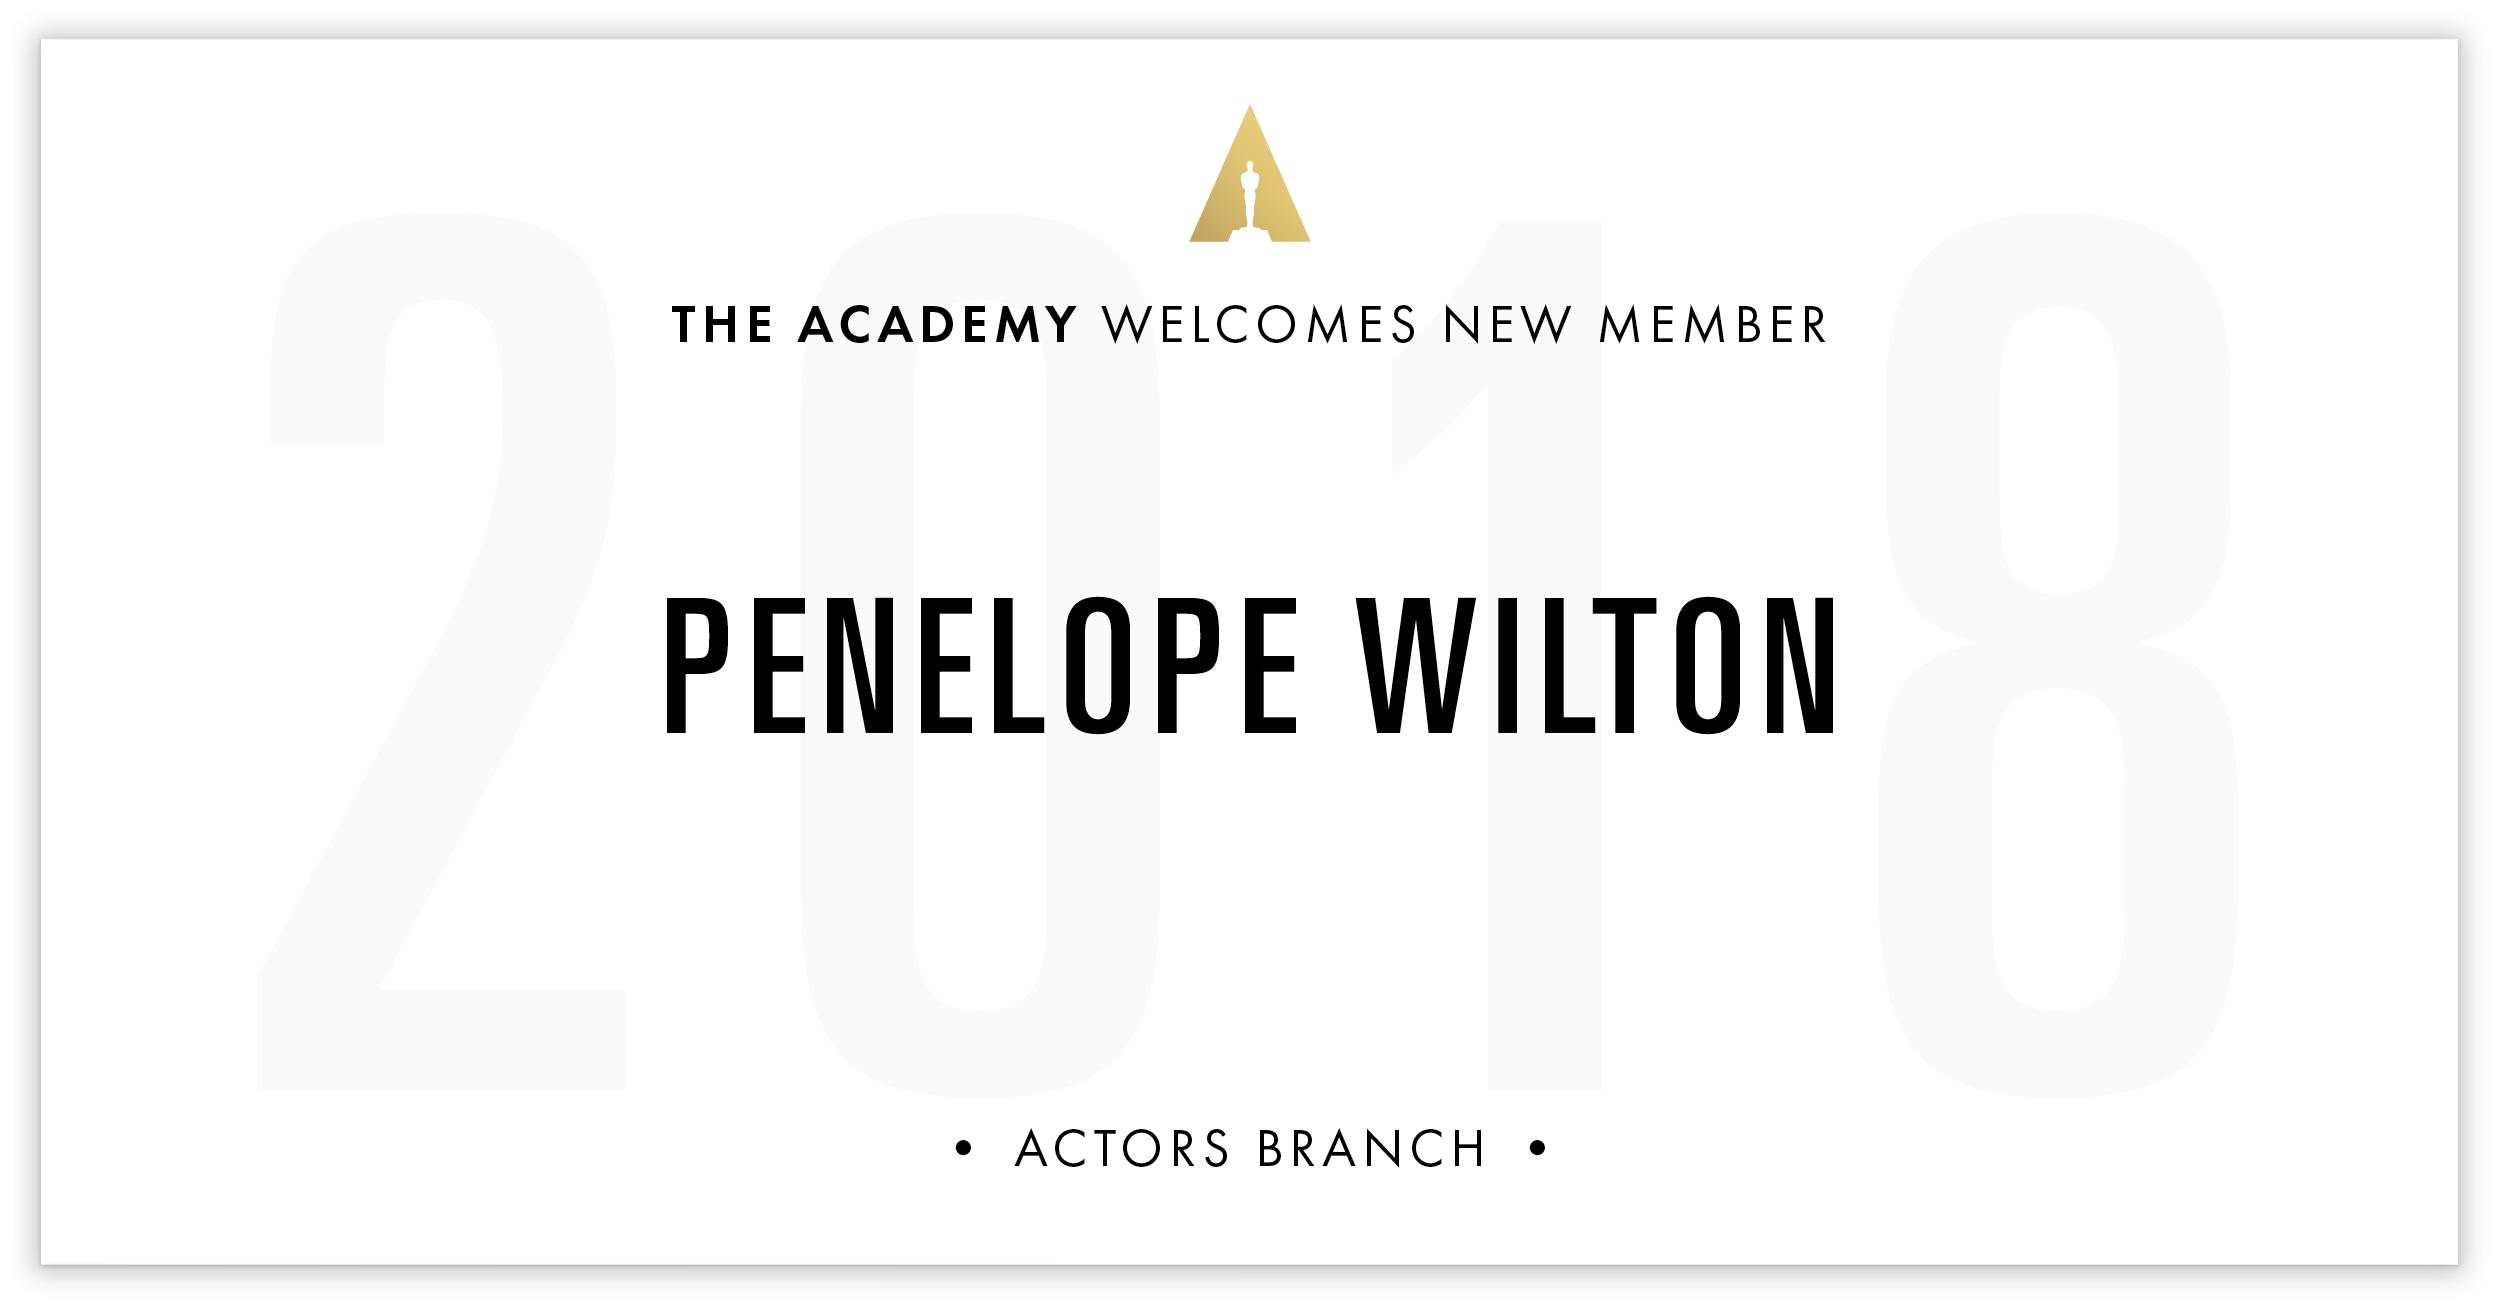 Penelope Wilton is invited!